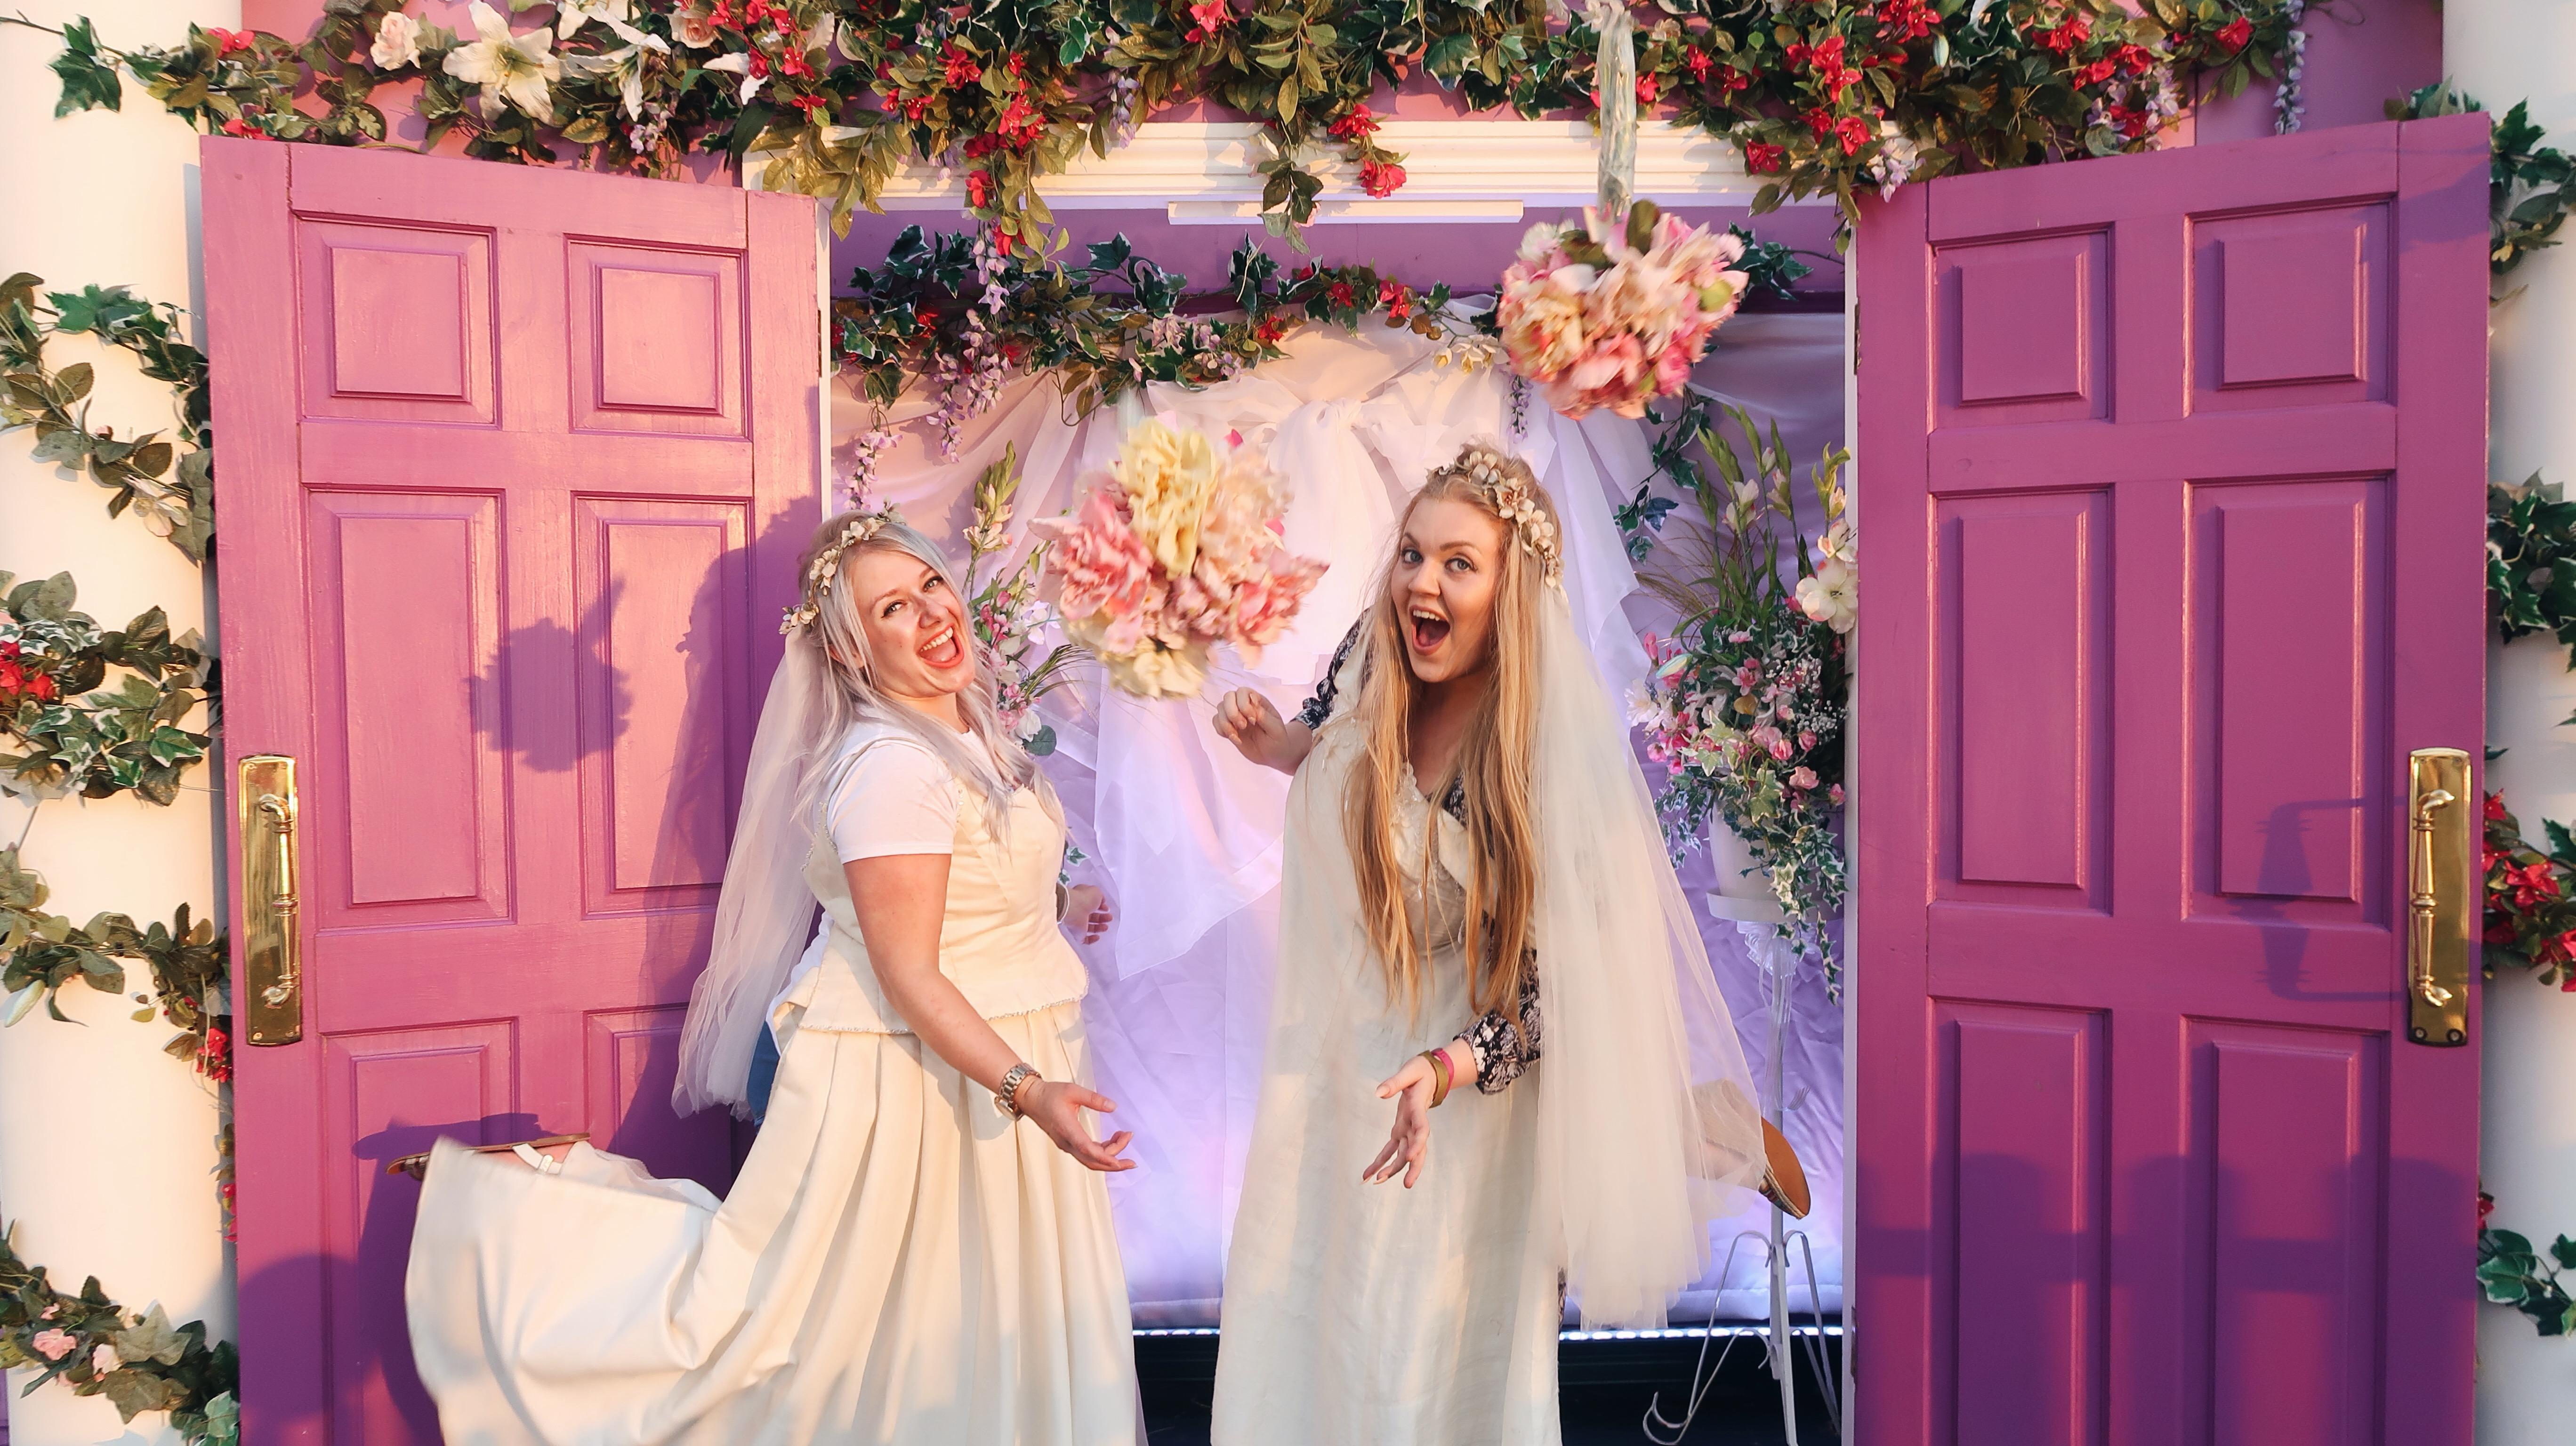 Friends Fest | On Set Tour of behind the scenes of Friends the TV show | Theatre, Festivals & Events | Elle Blonde Luxury Lifestyle Destination Blog